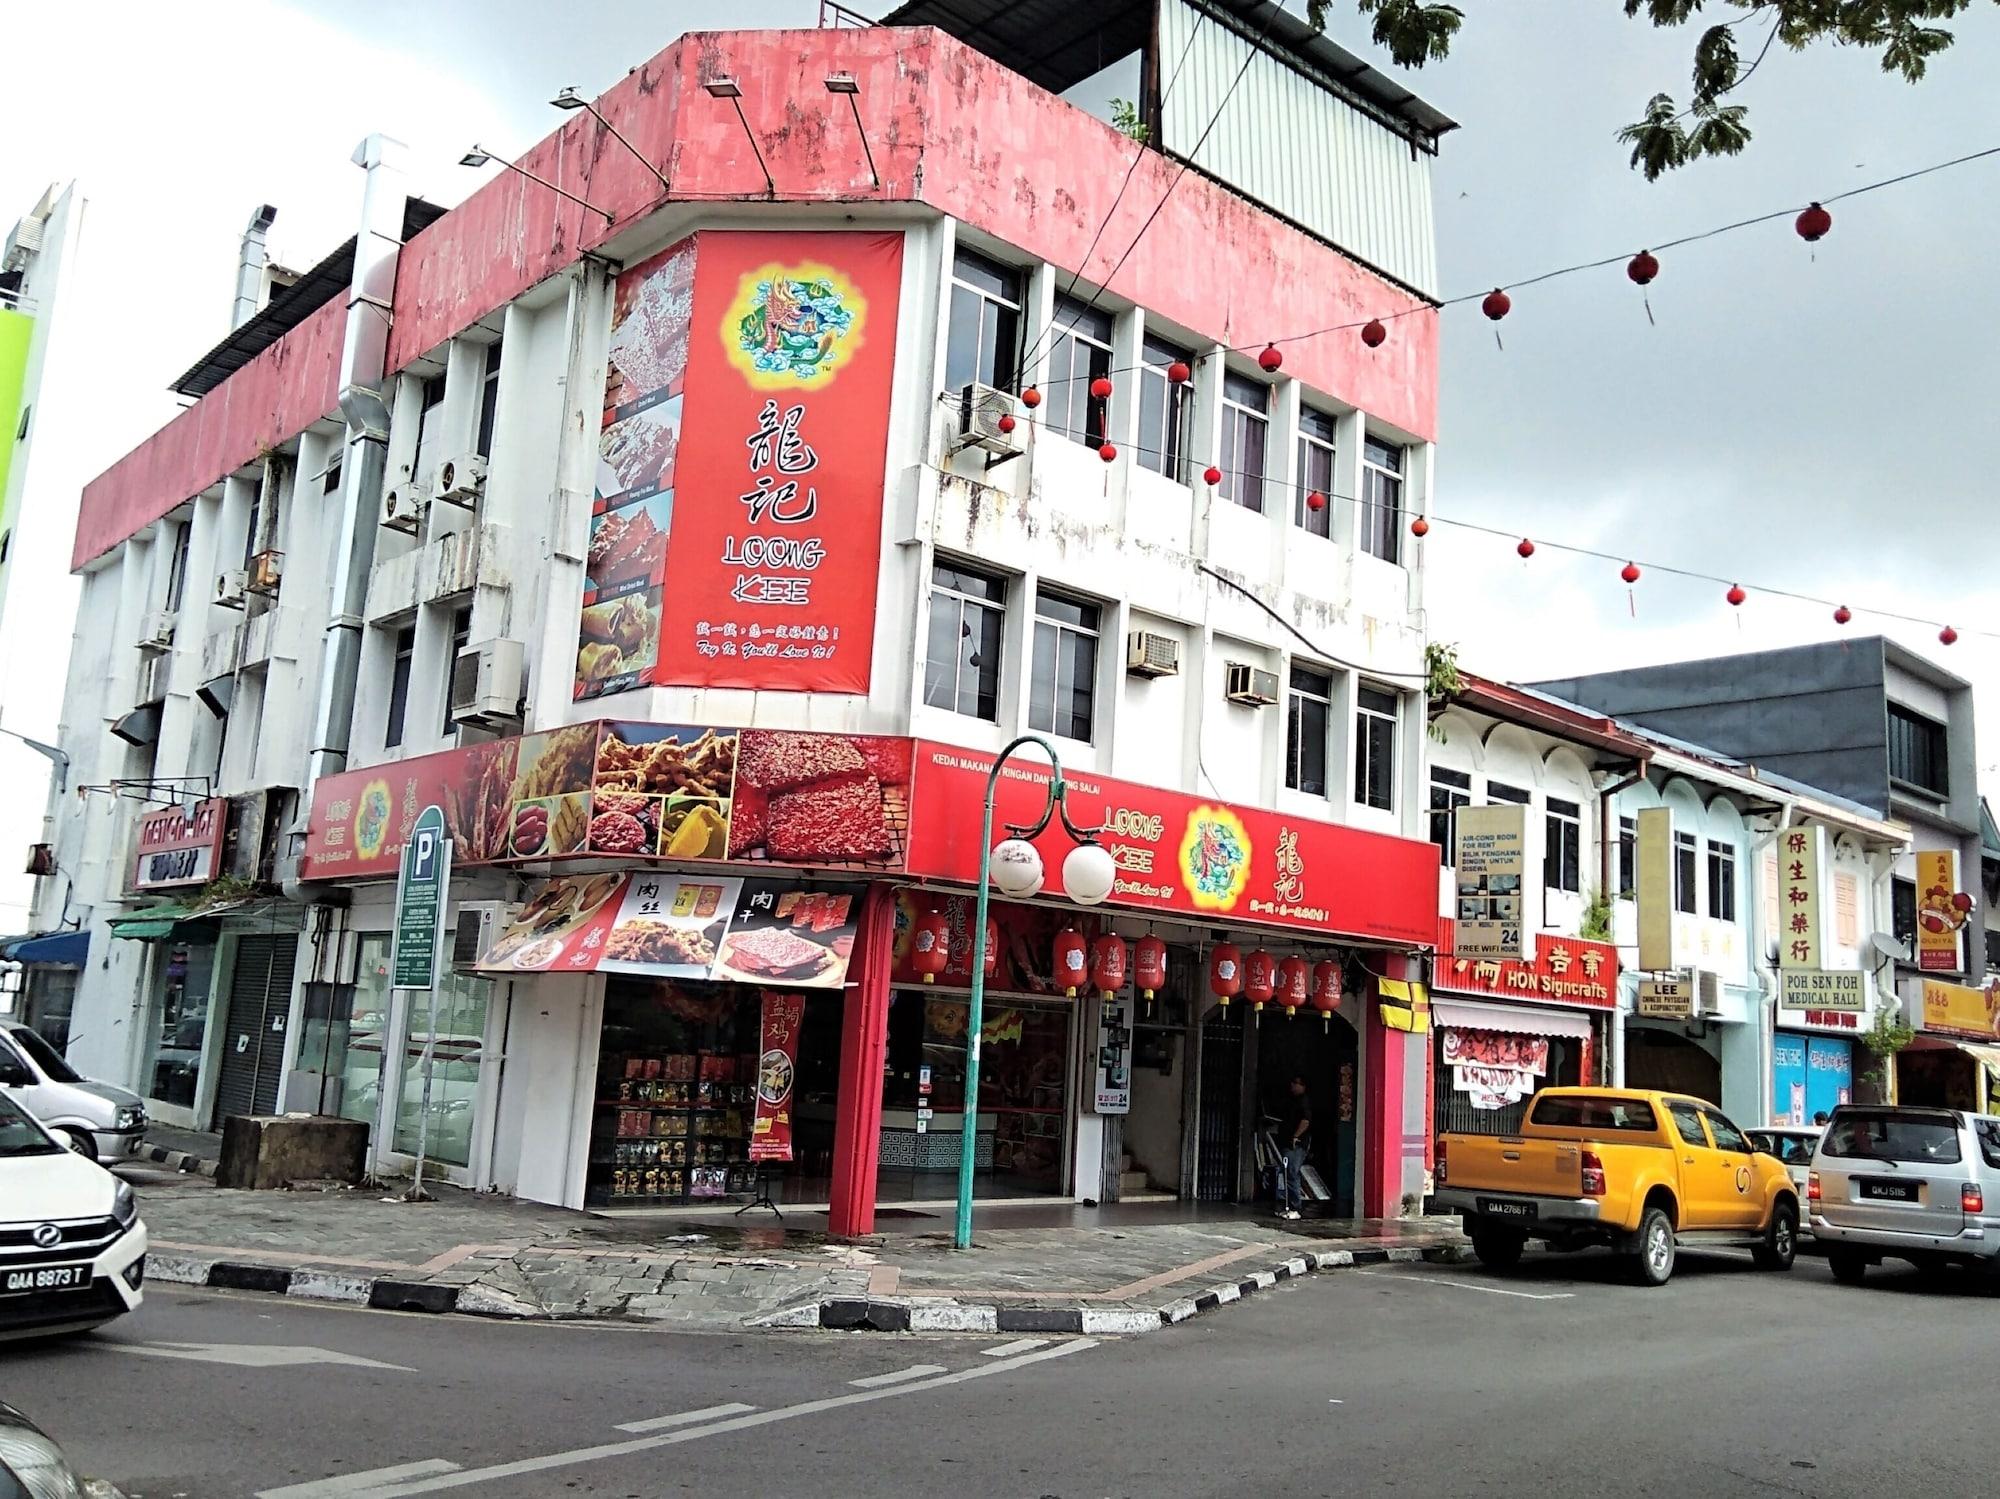 SPOT ON 89830 Cat City Inn, Kuching